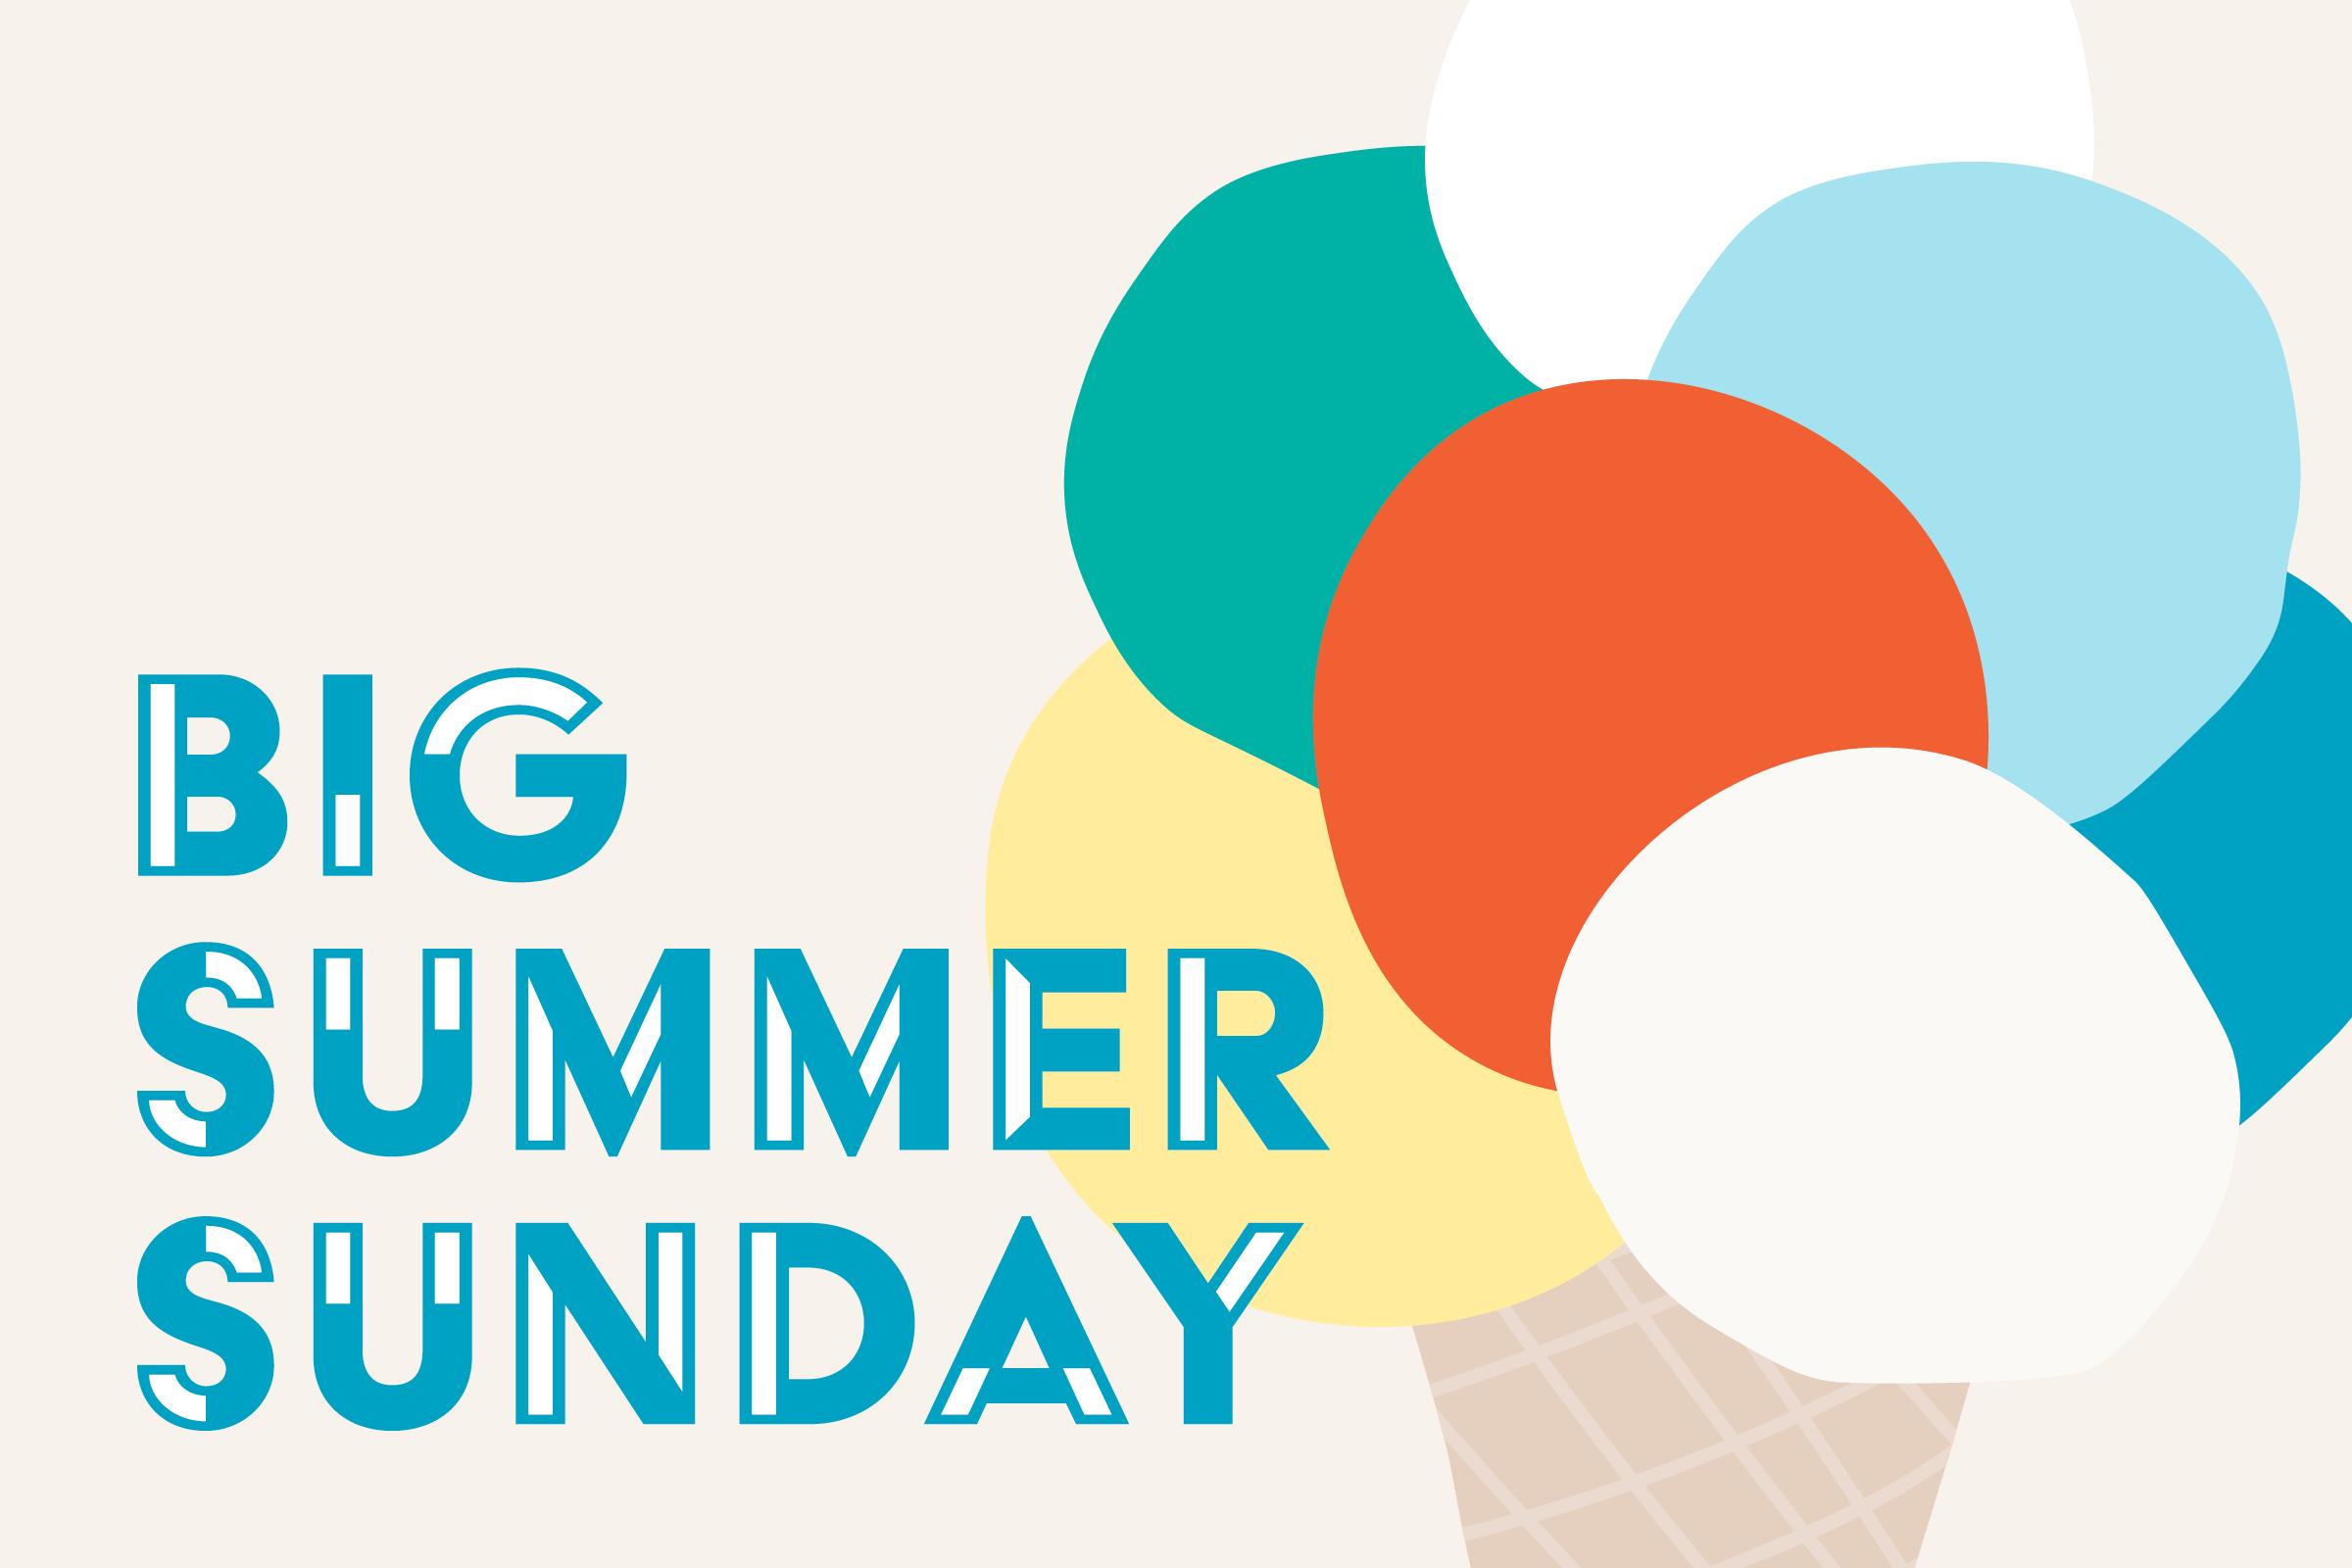 Big-Summer-Sunday_2019_WebTile_3x2.png